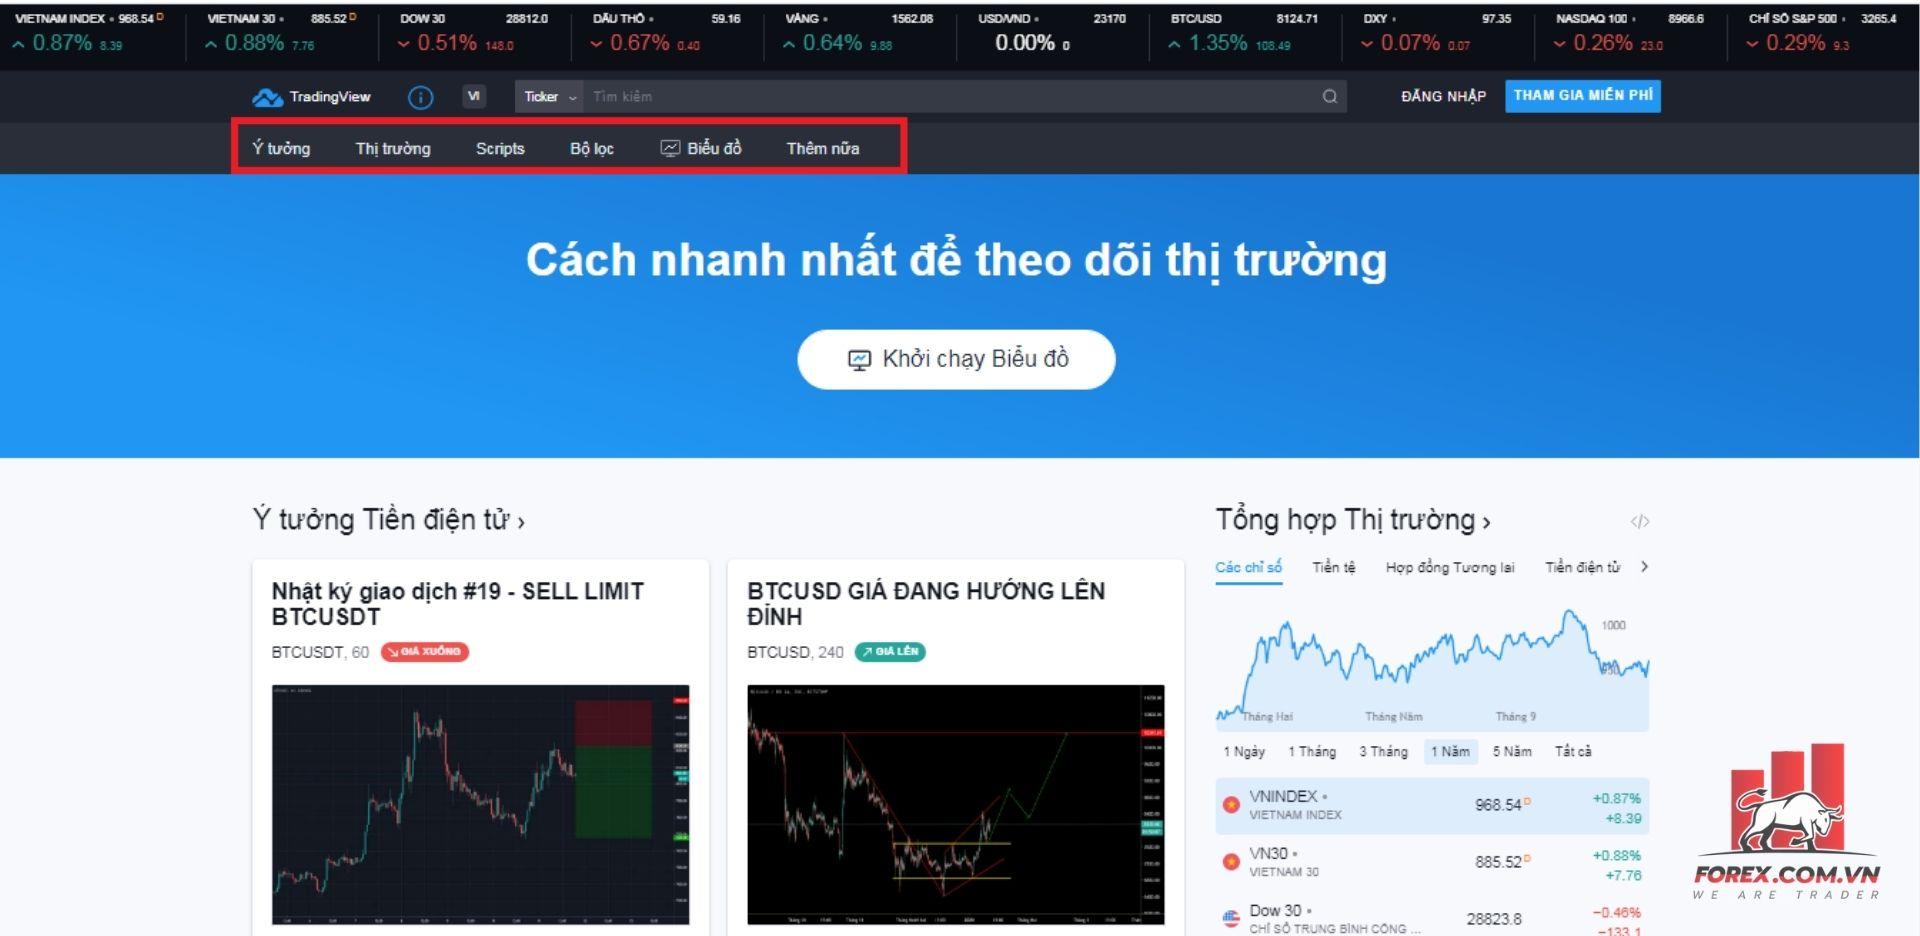 Giới thiệu tổng quan giao diện TradingView 2